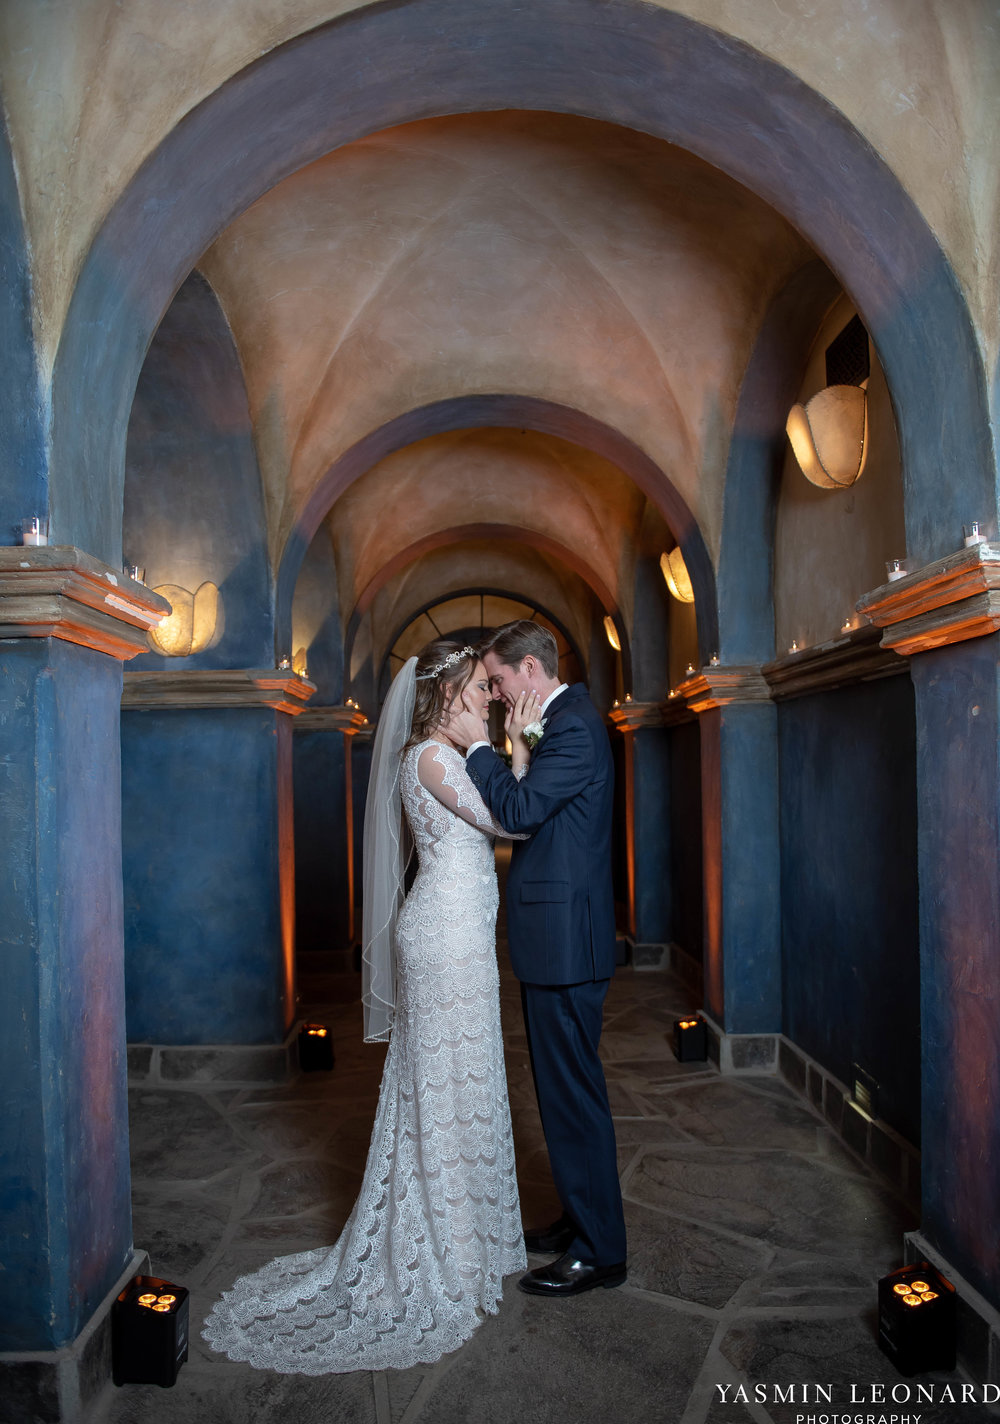 The Lofts at Union Square - Unions - High Point Weddings - NC Weddings - NC Wedding Photographer - Yasmin Leonard Photography - Just Priceless - Green Pink and Gold Wedding - Elegant Wedding-38.jpg